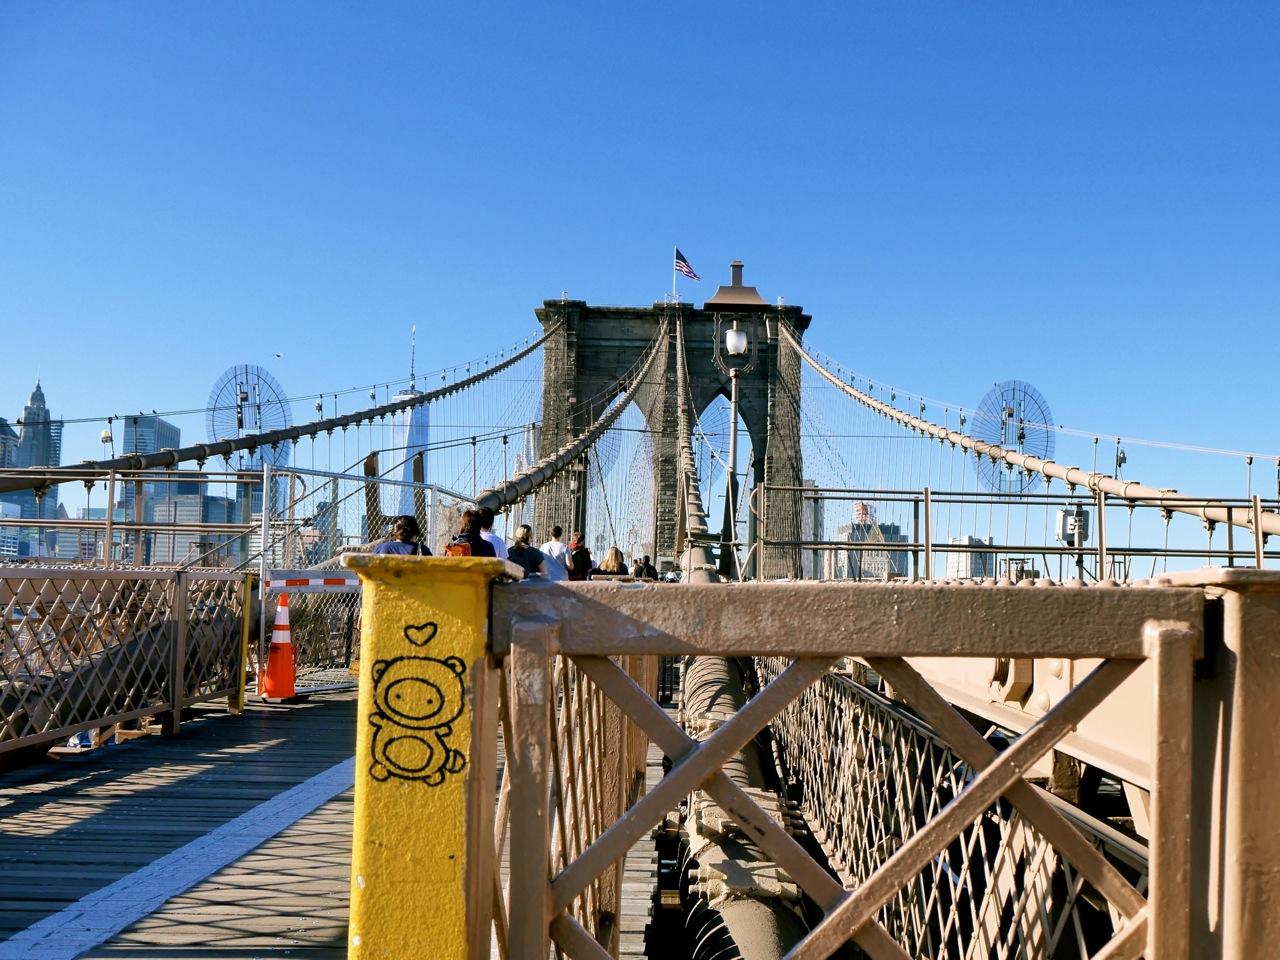 New York Brooklyn Bridge sweet malindkate